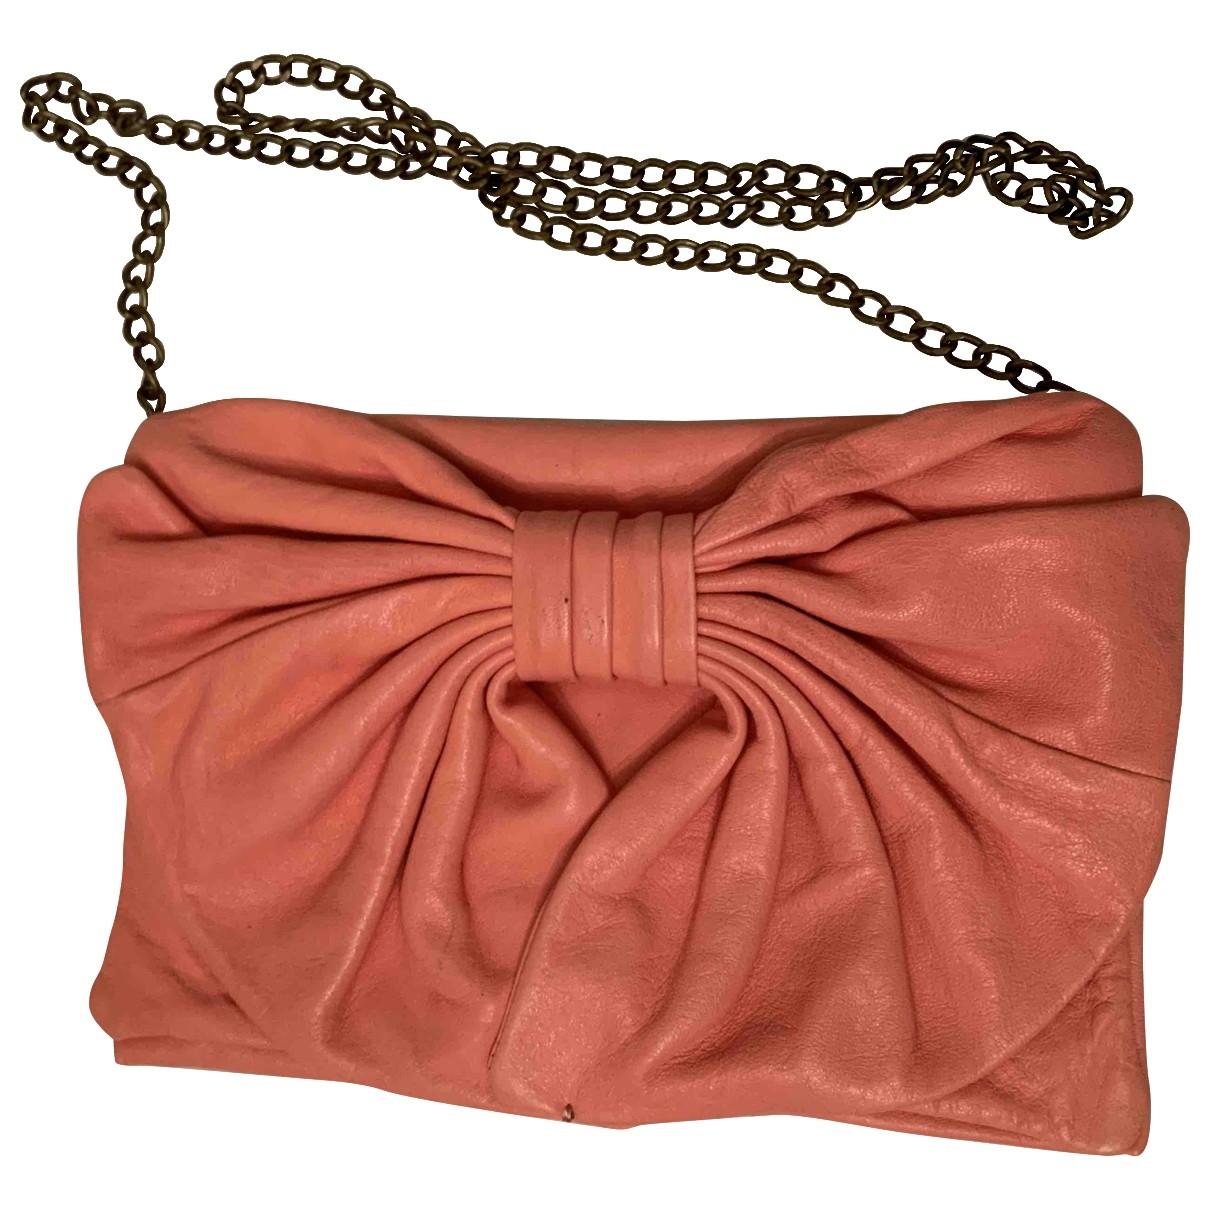 Red Valentino Garavani \N Pink Leather Clutch bag for Women \N